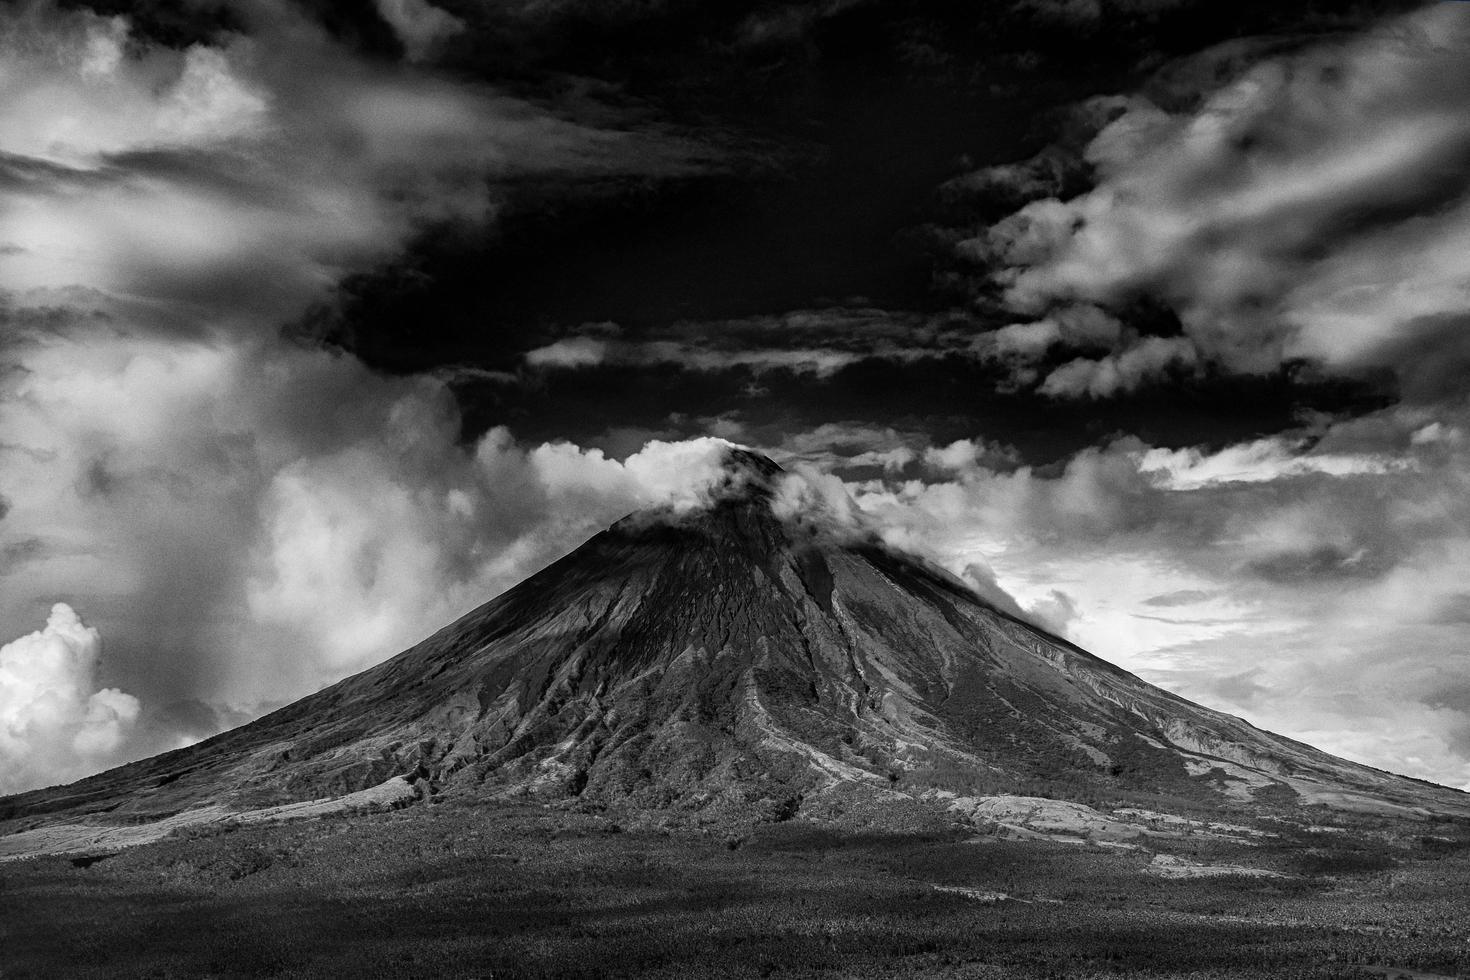 Grayscale of volcano photo